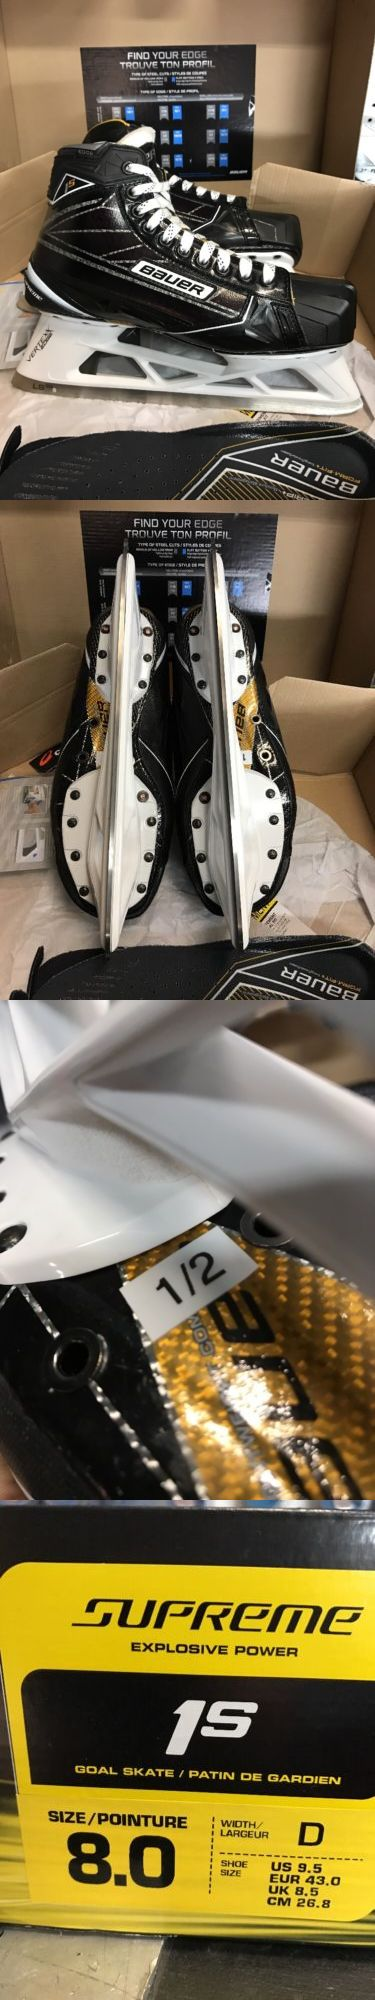 Ice Hockey-Adult 20858: Bauer Supreme 1S Sr Ice Hockey Goalie Skates 8D Brand New -> BUY IT NOW ONLY: $650 on eBay!